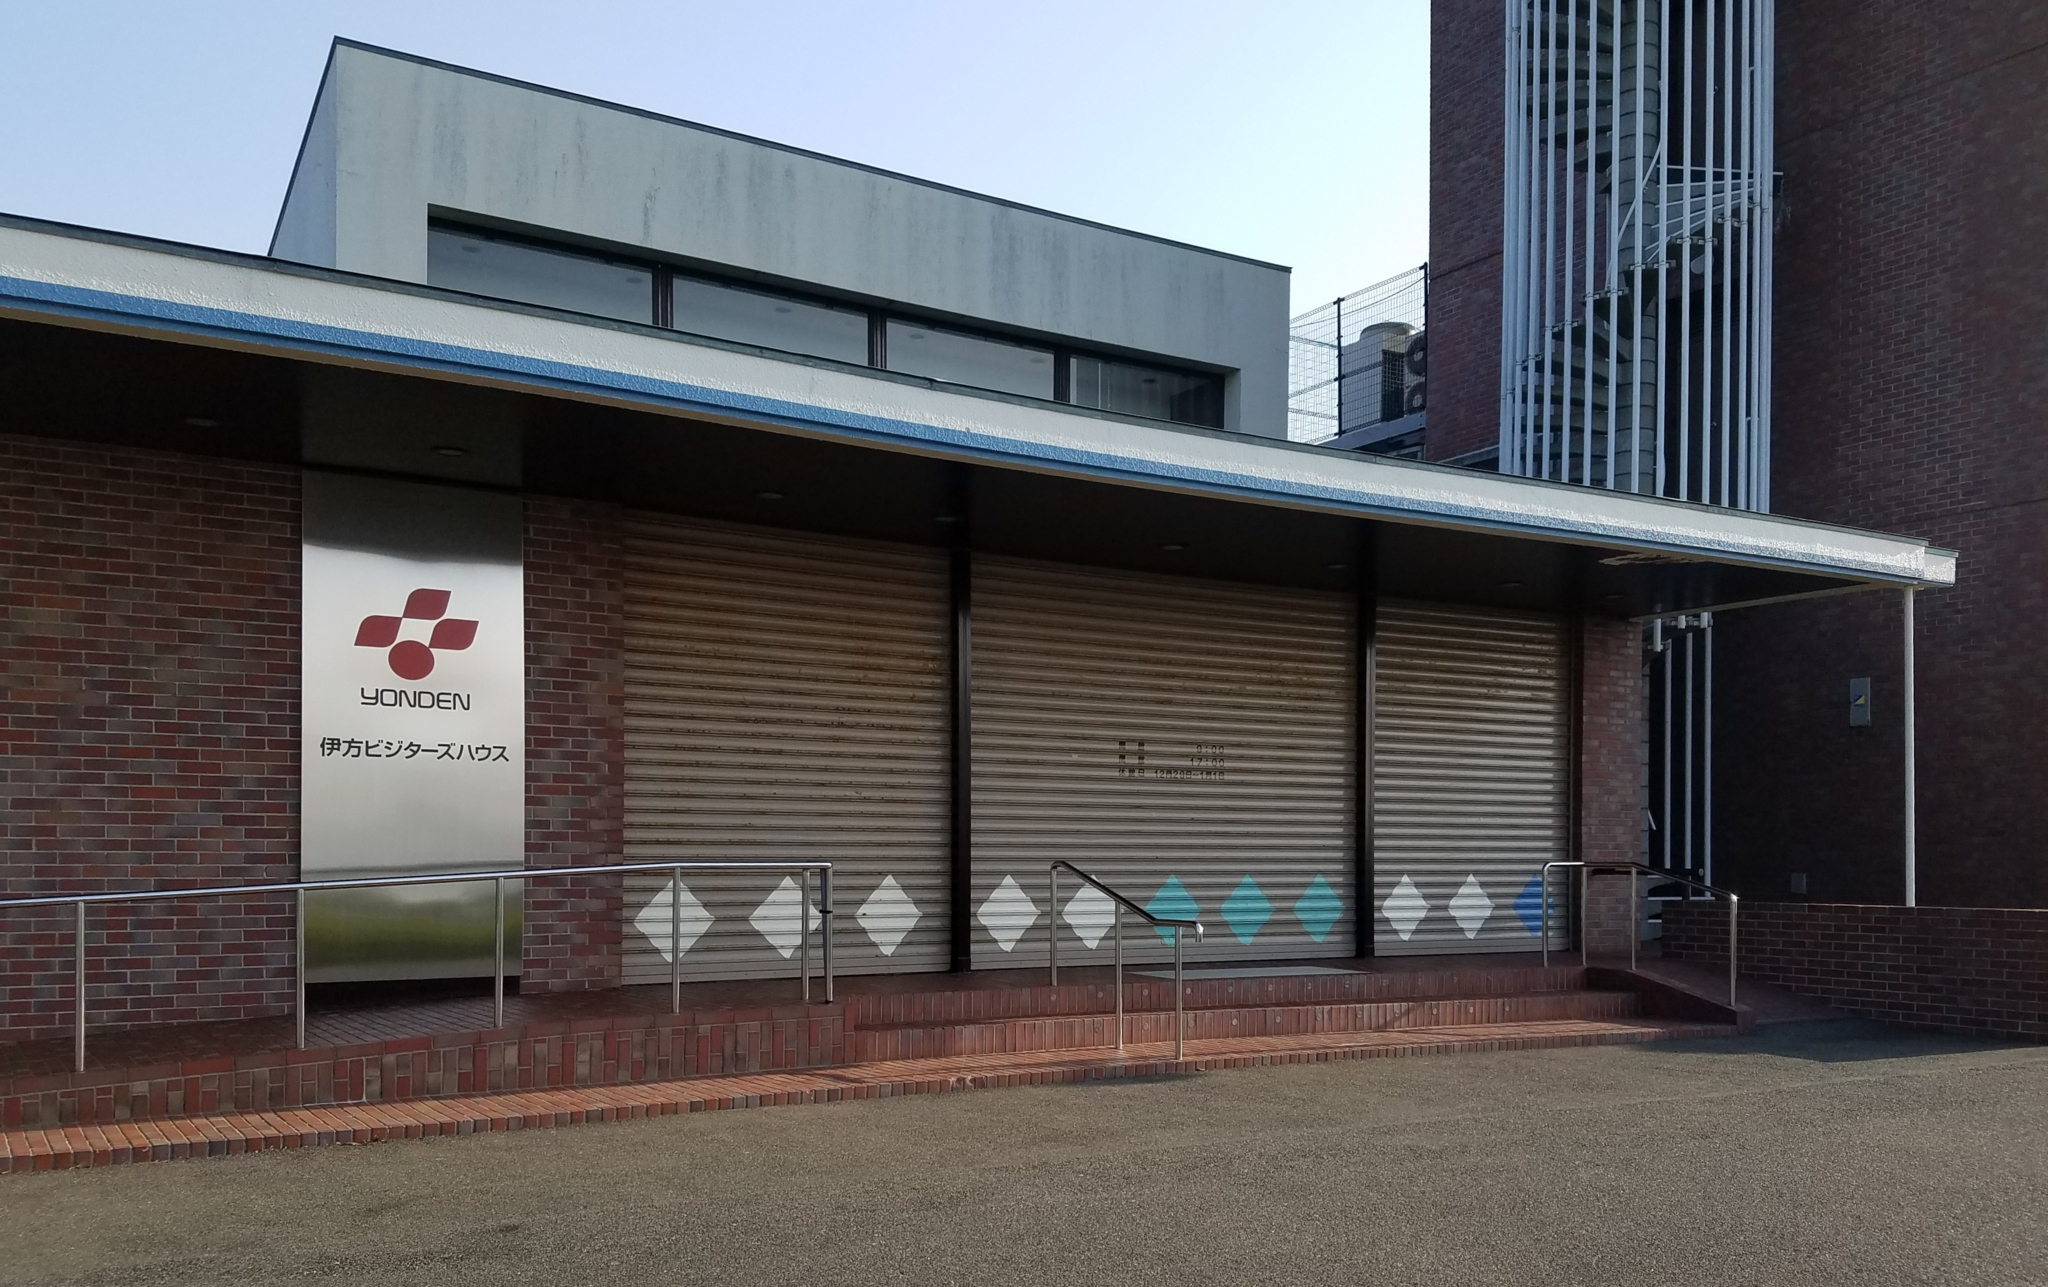 f:id:ToshUeno:20170430170637j:plain